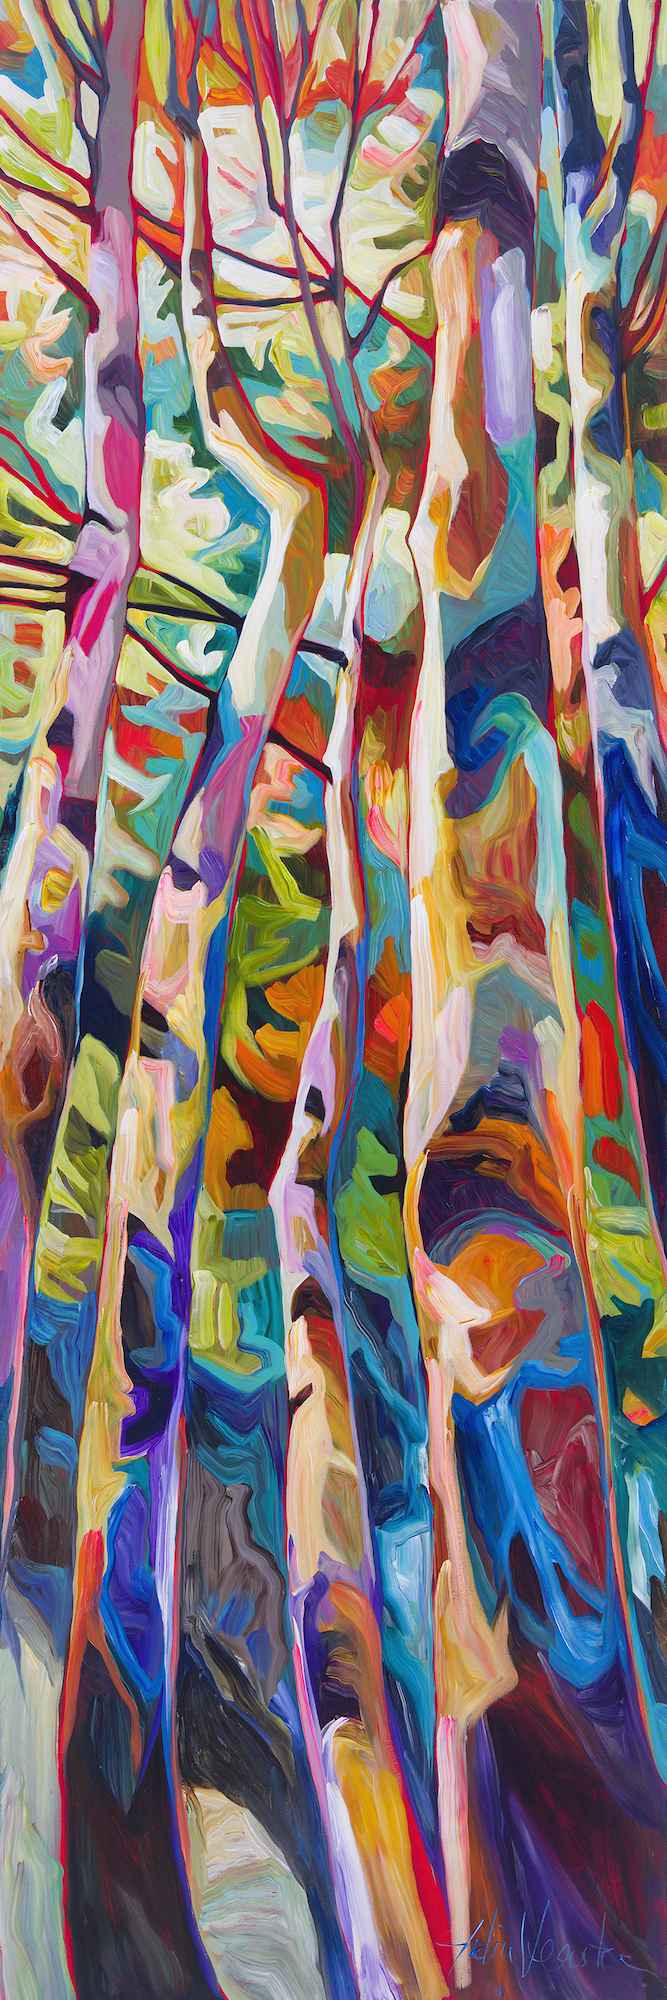 Heredity by  Julia Veenstra - Masterpiece Online